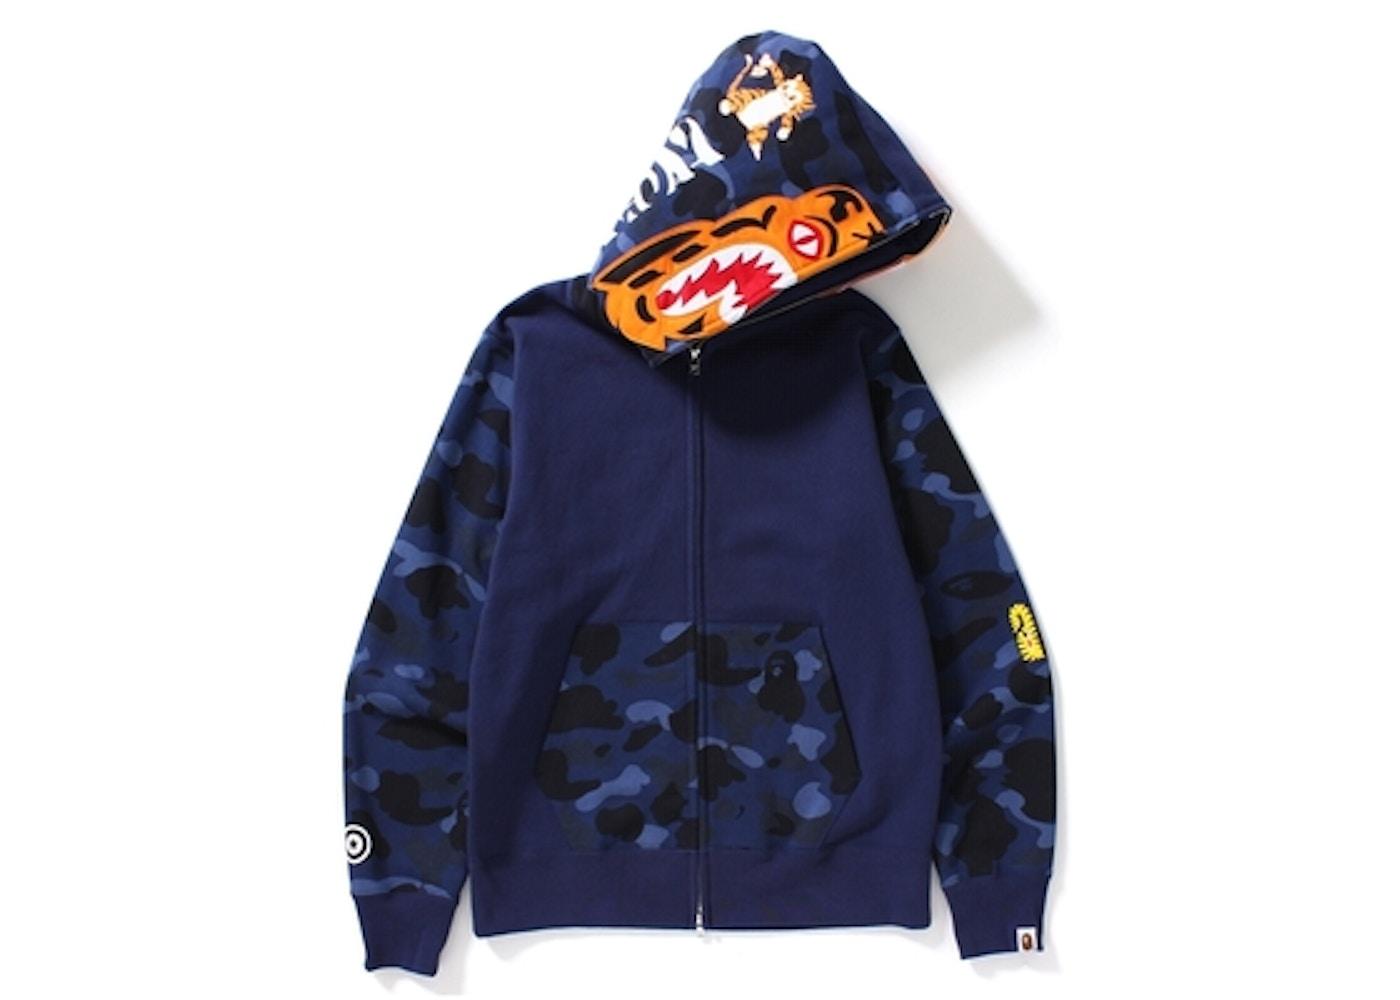 e3c0c173a162 BAPE Color Camo Tiger Full Zip Hoodie Navy -